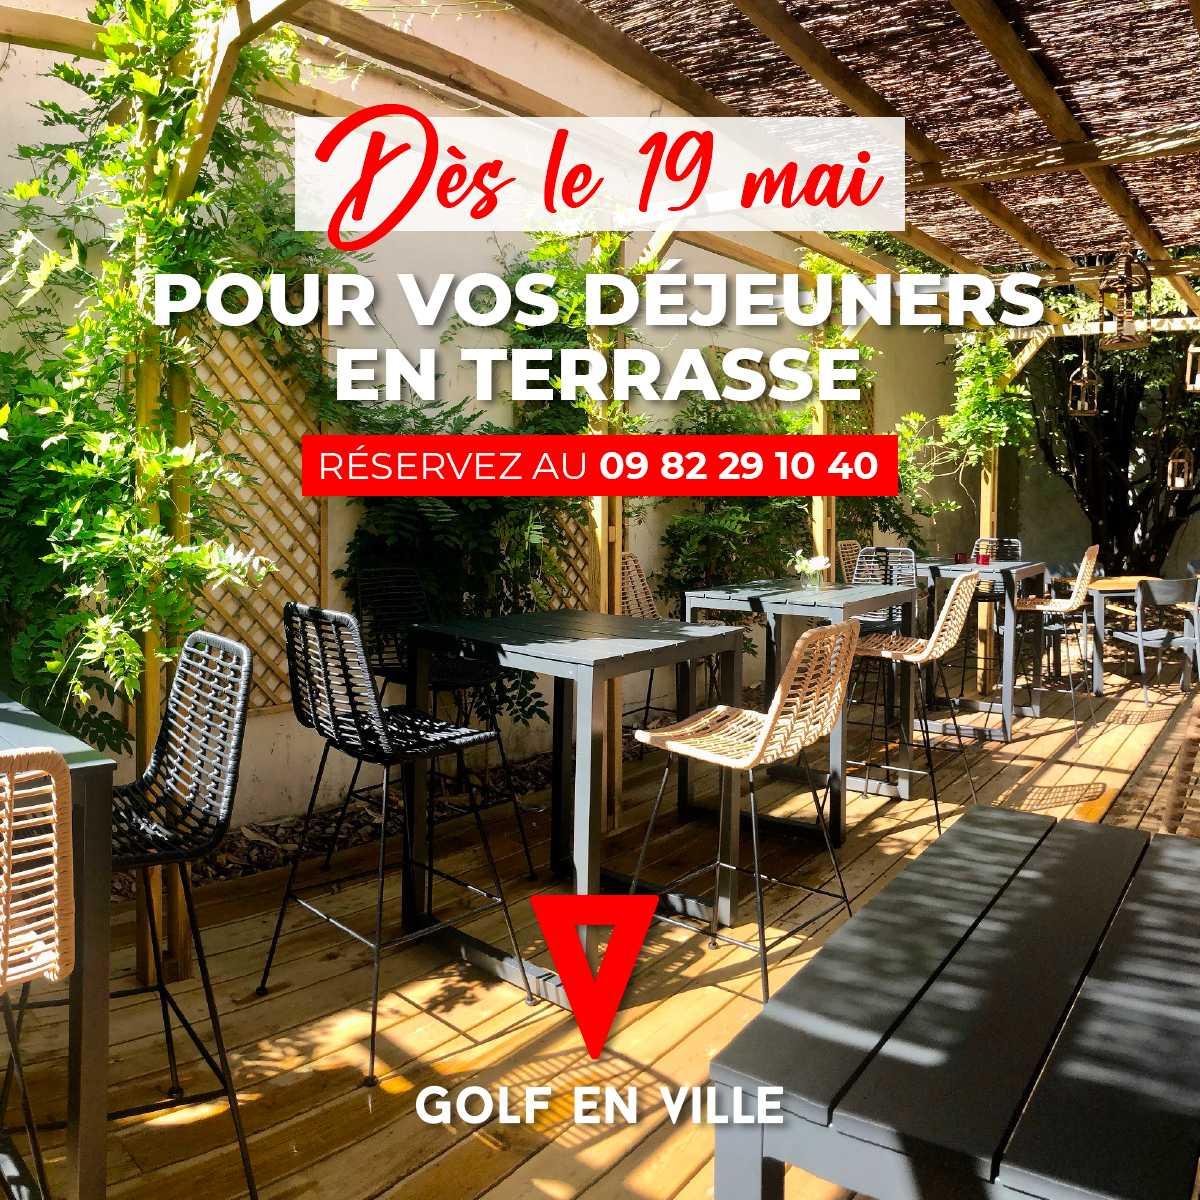 restaurant-bar-golf-paris-indoor-terrasse-ouverture-19-mai